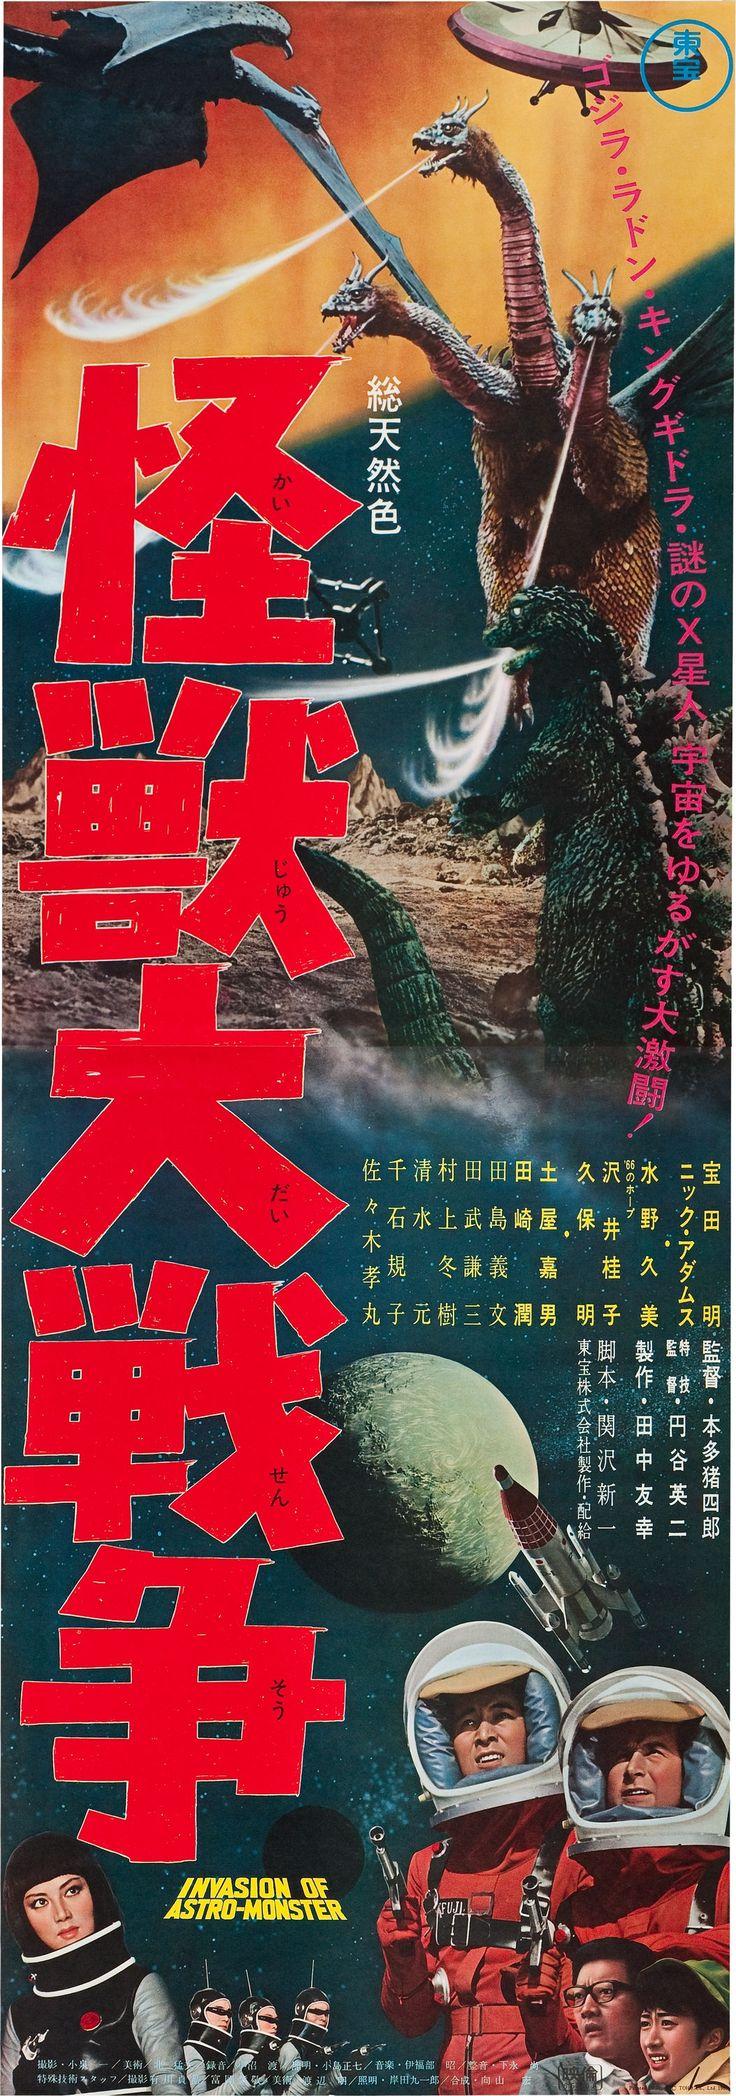 Godzilla vs Monster Zero (1965) | japanese exploitation kaiju vintage poster art